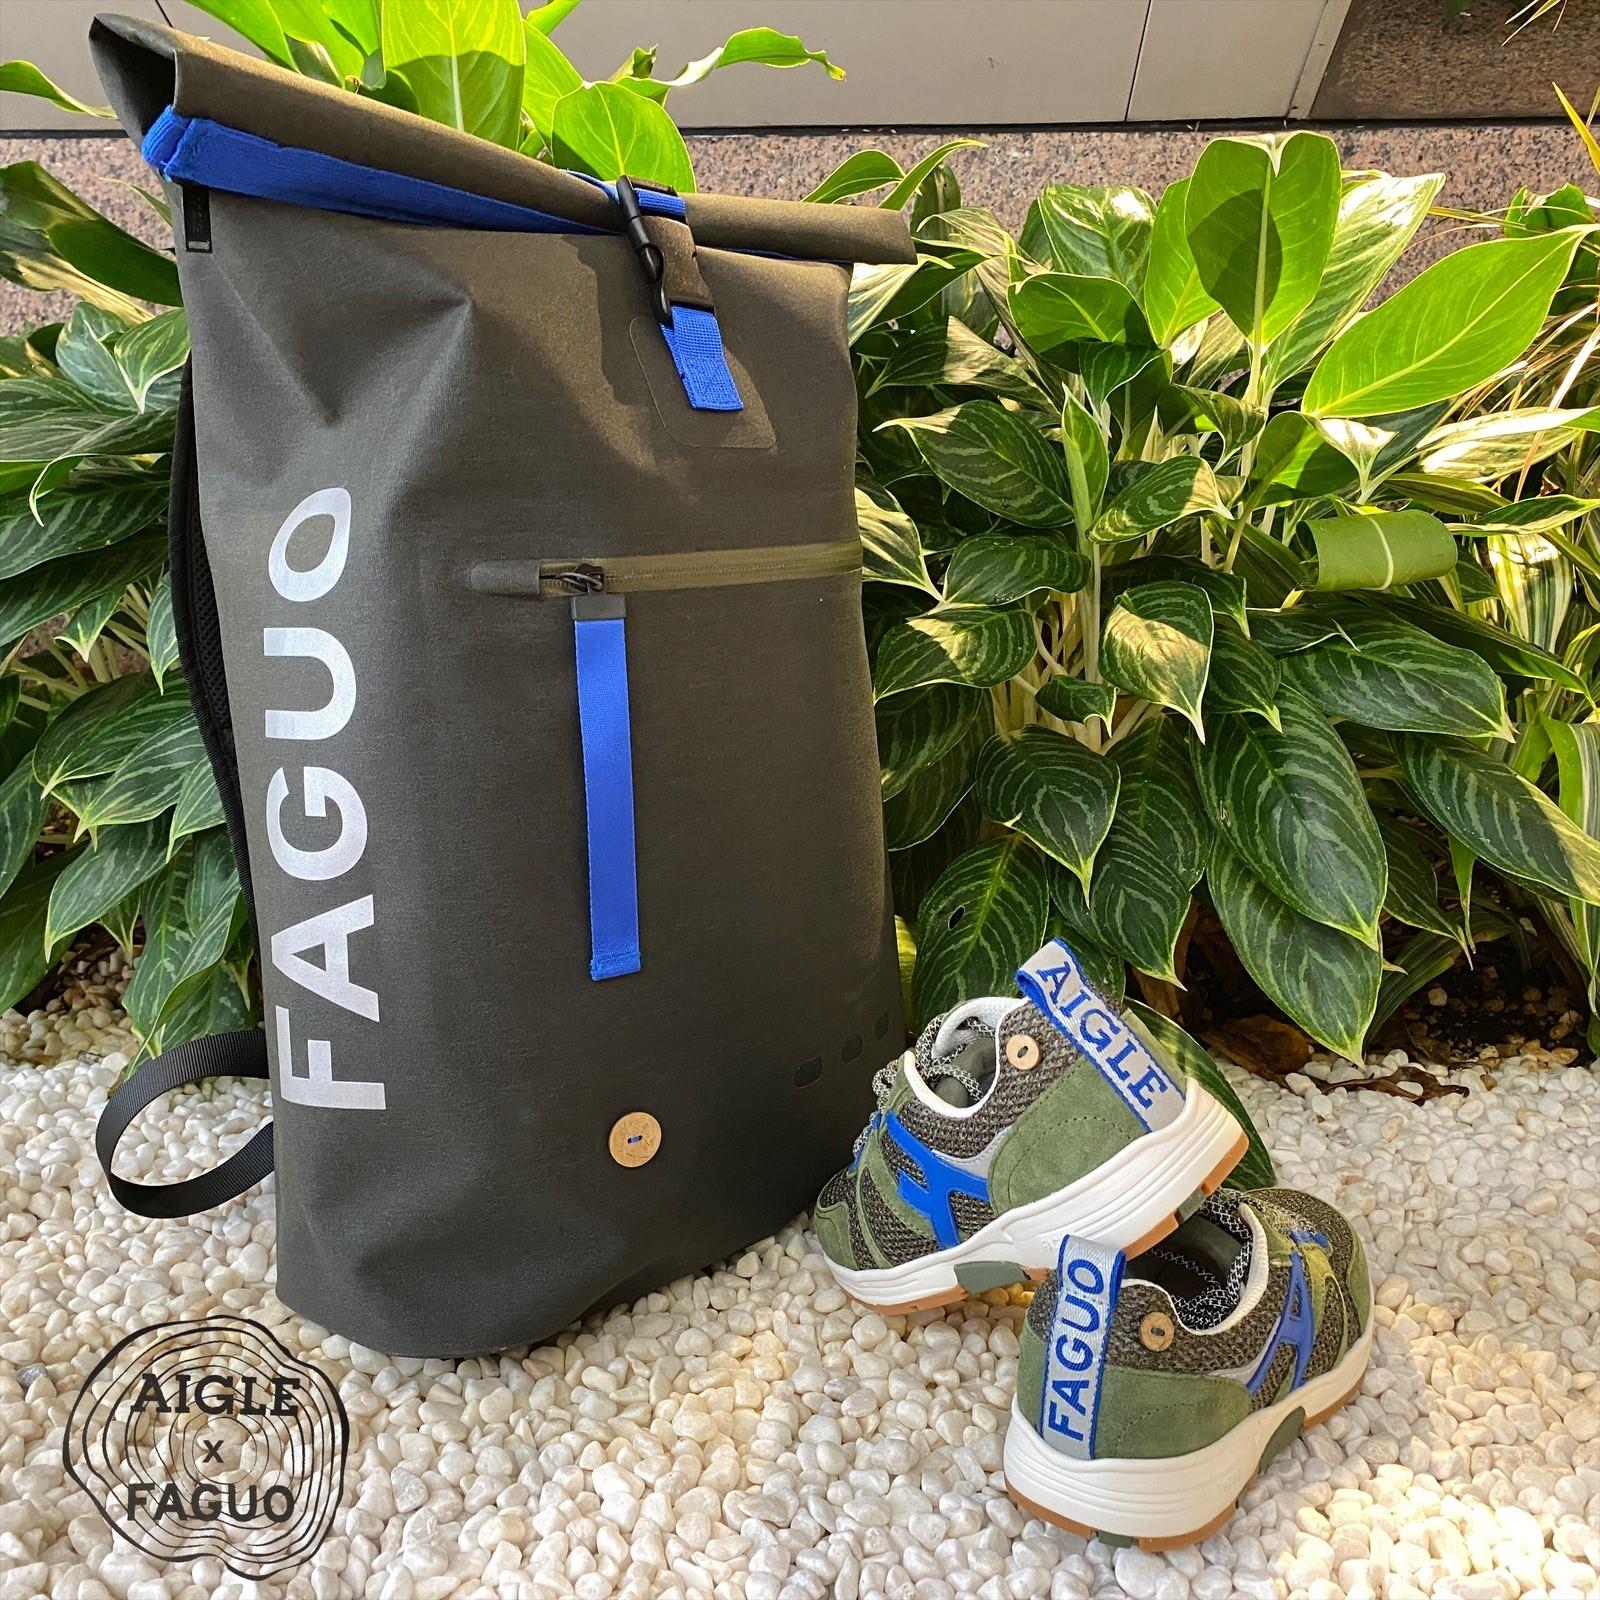 AIGLE時代廣場專門店 《AIGLE×FAGUO》環保聯乘系列及購物優惠